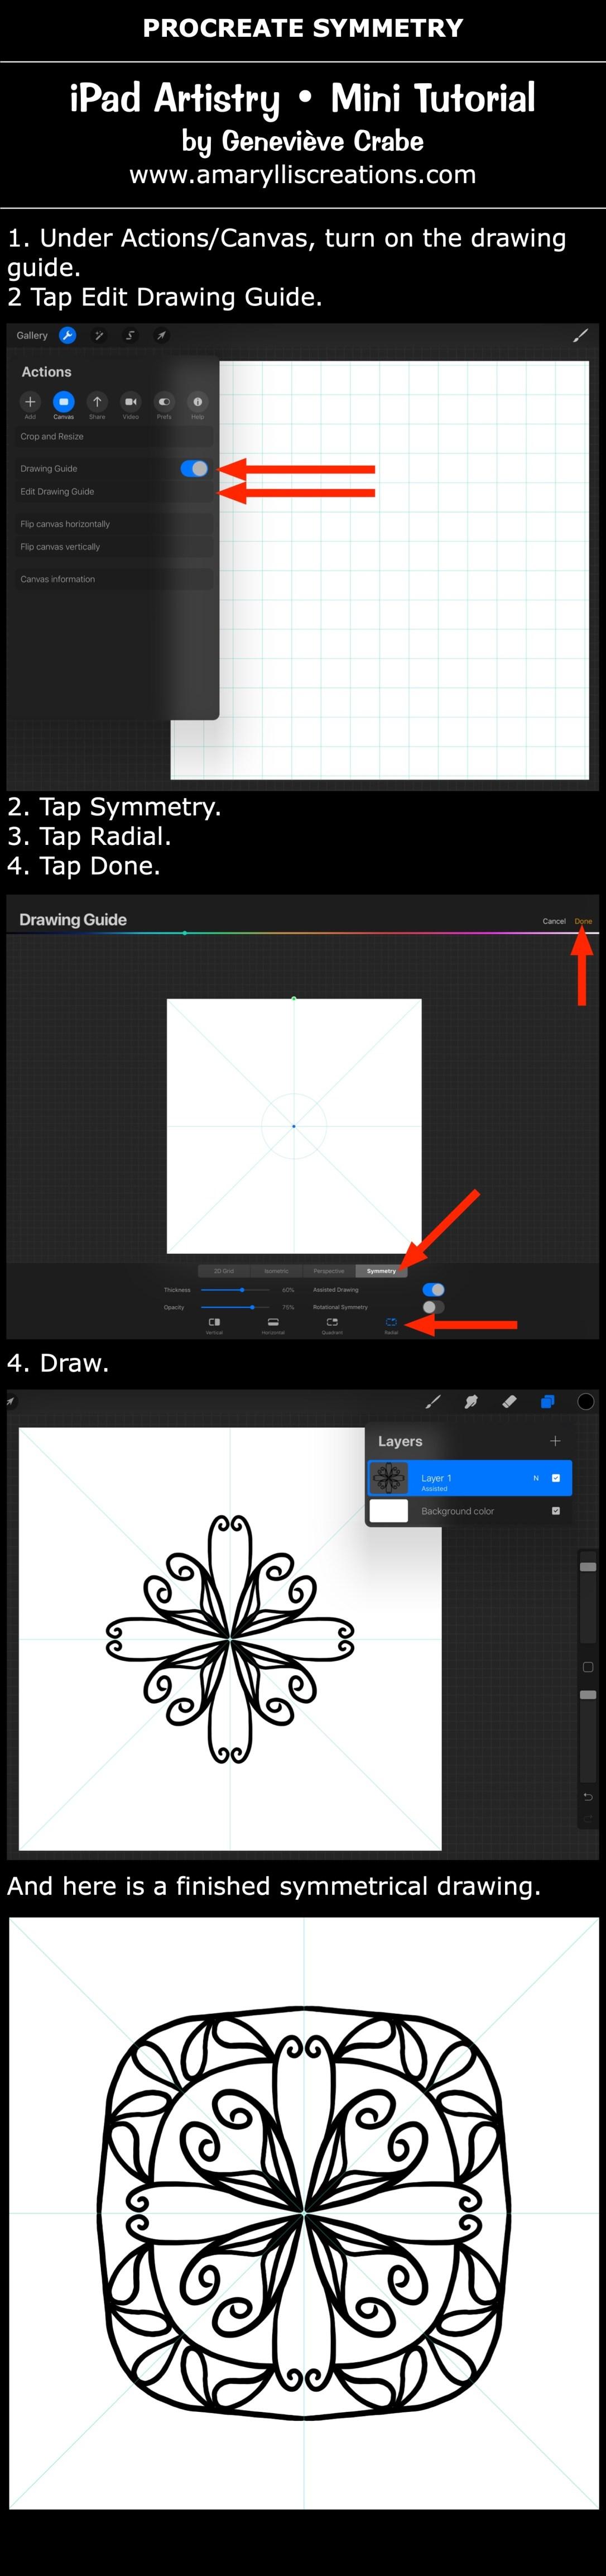 Mini tutorial: Draw with Symmetry in Procreate on iPad